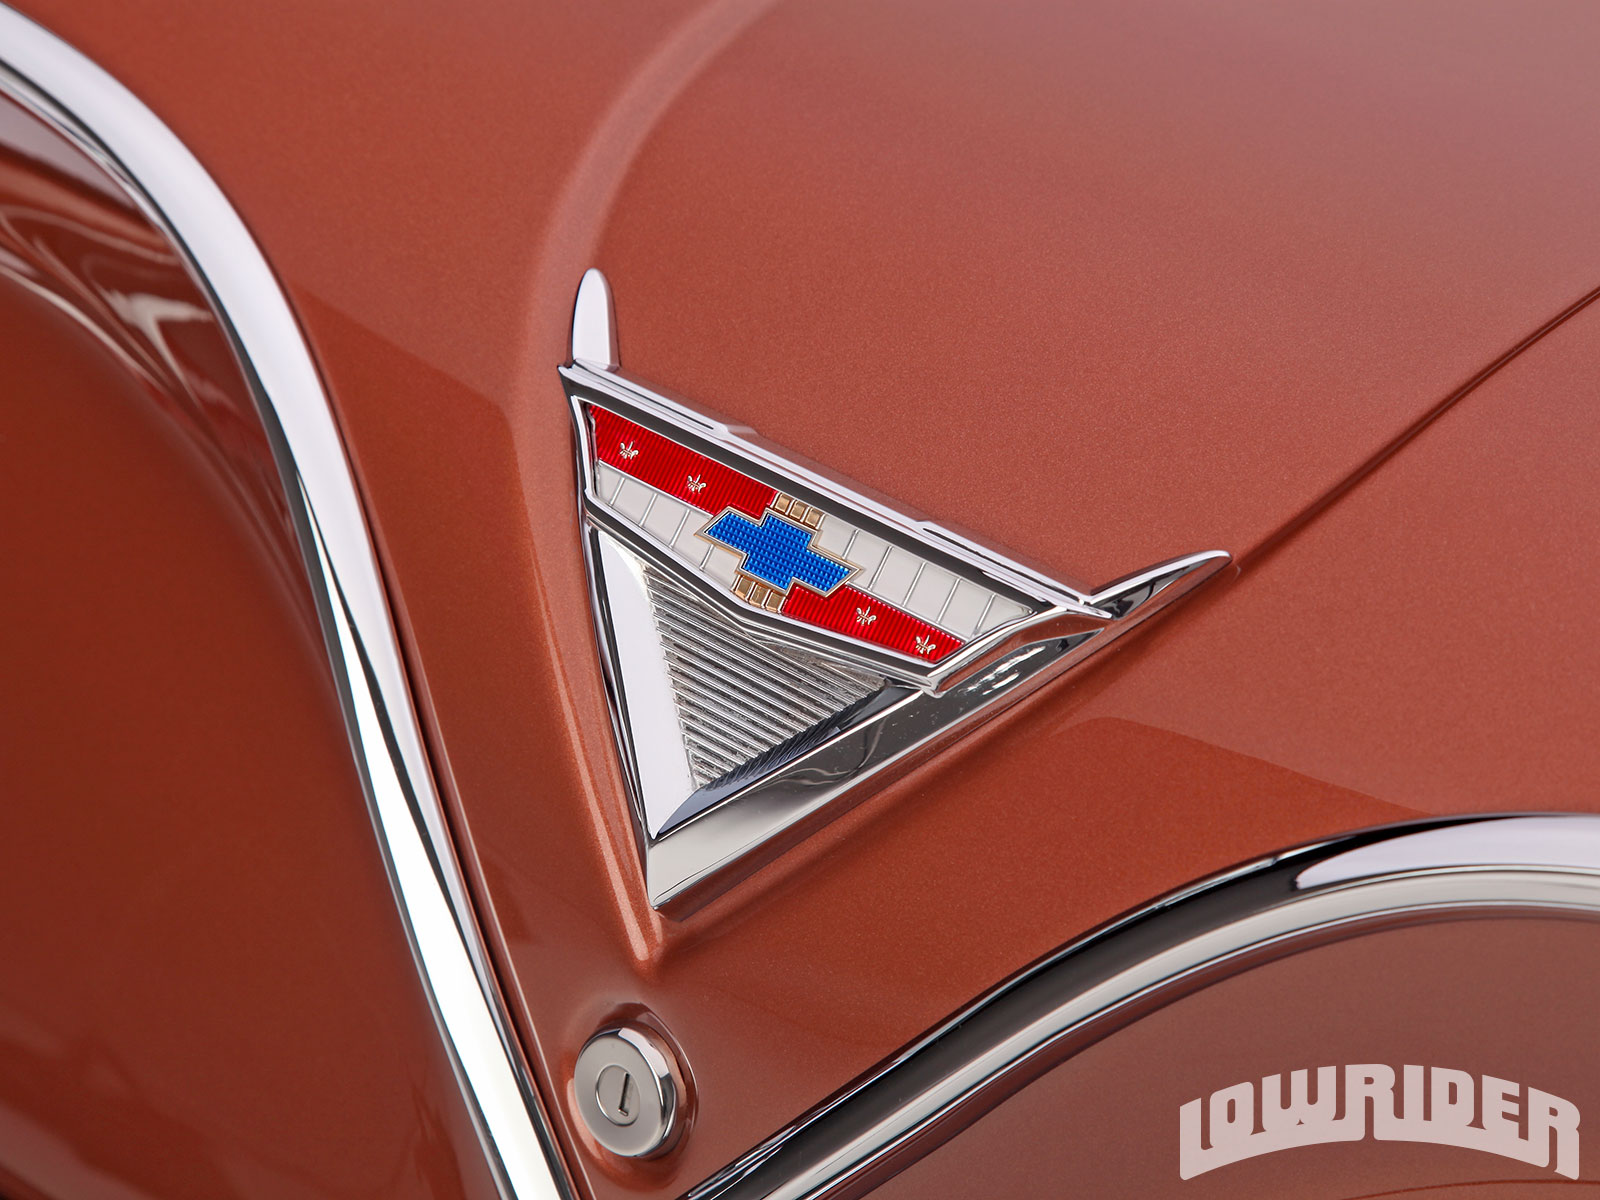 1961 Chevrolet Impala Pretty Penny Hydraulic Setup Of The Year